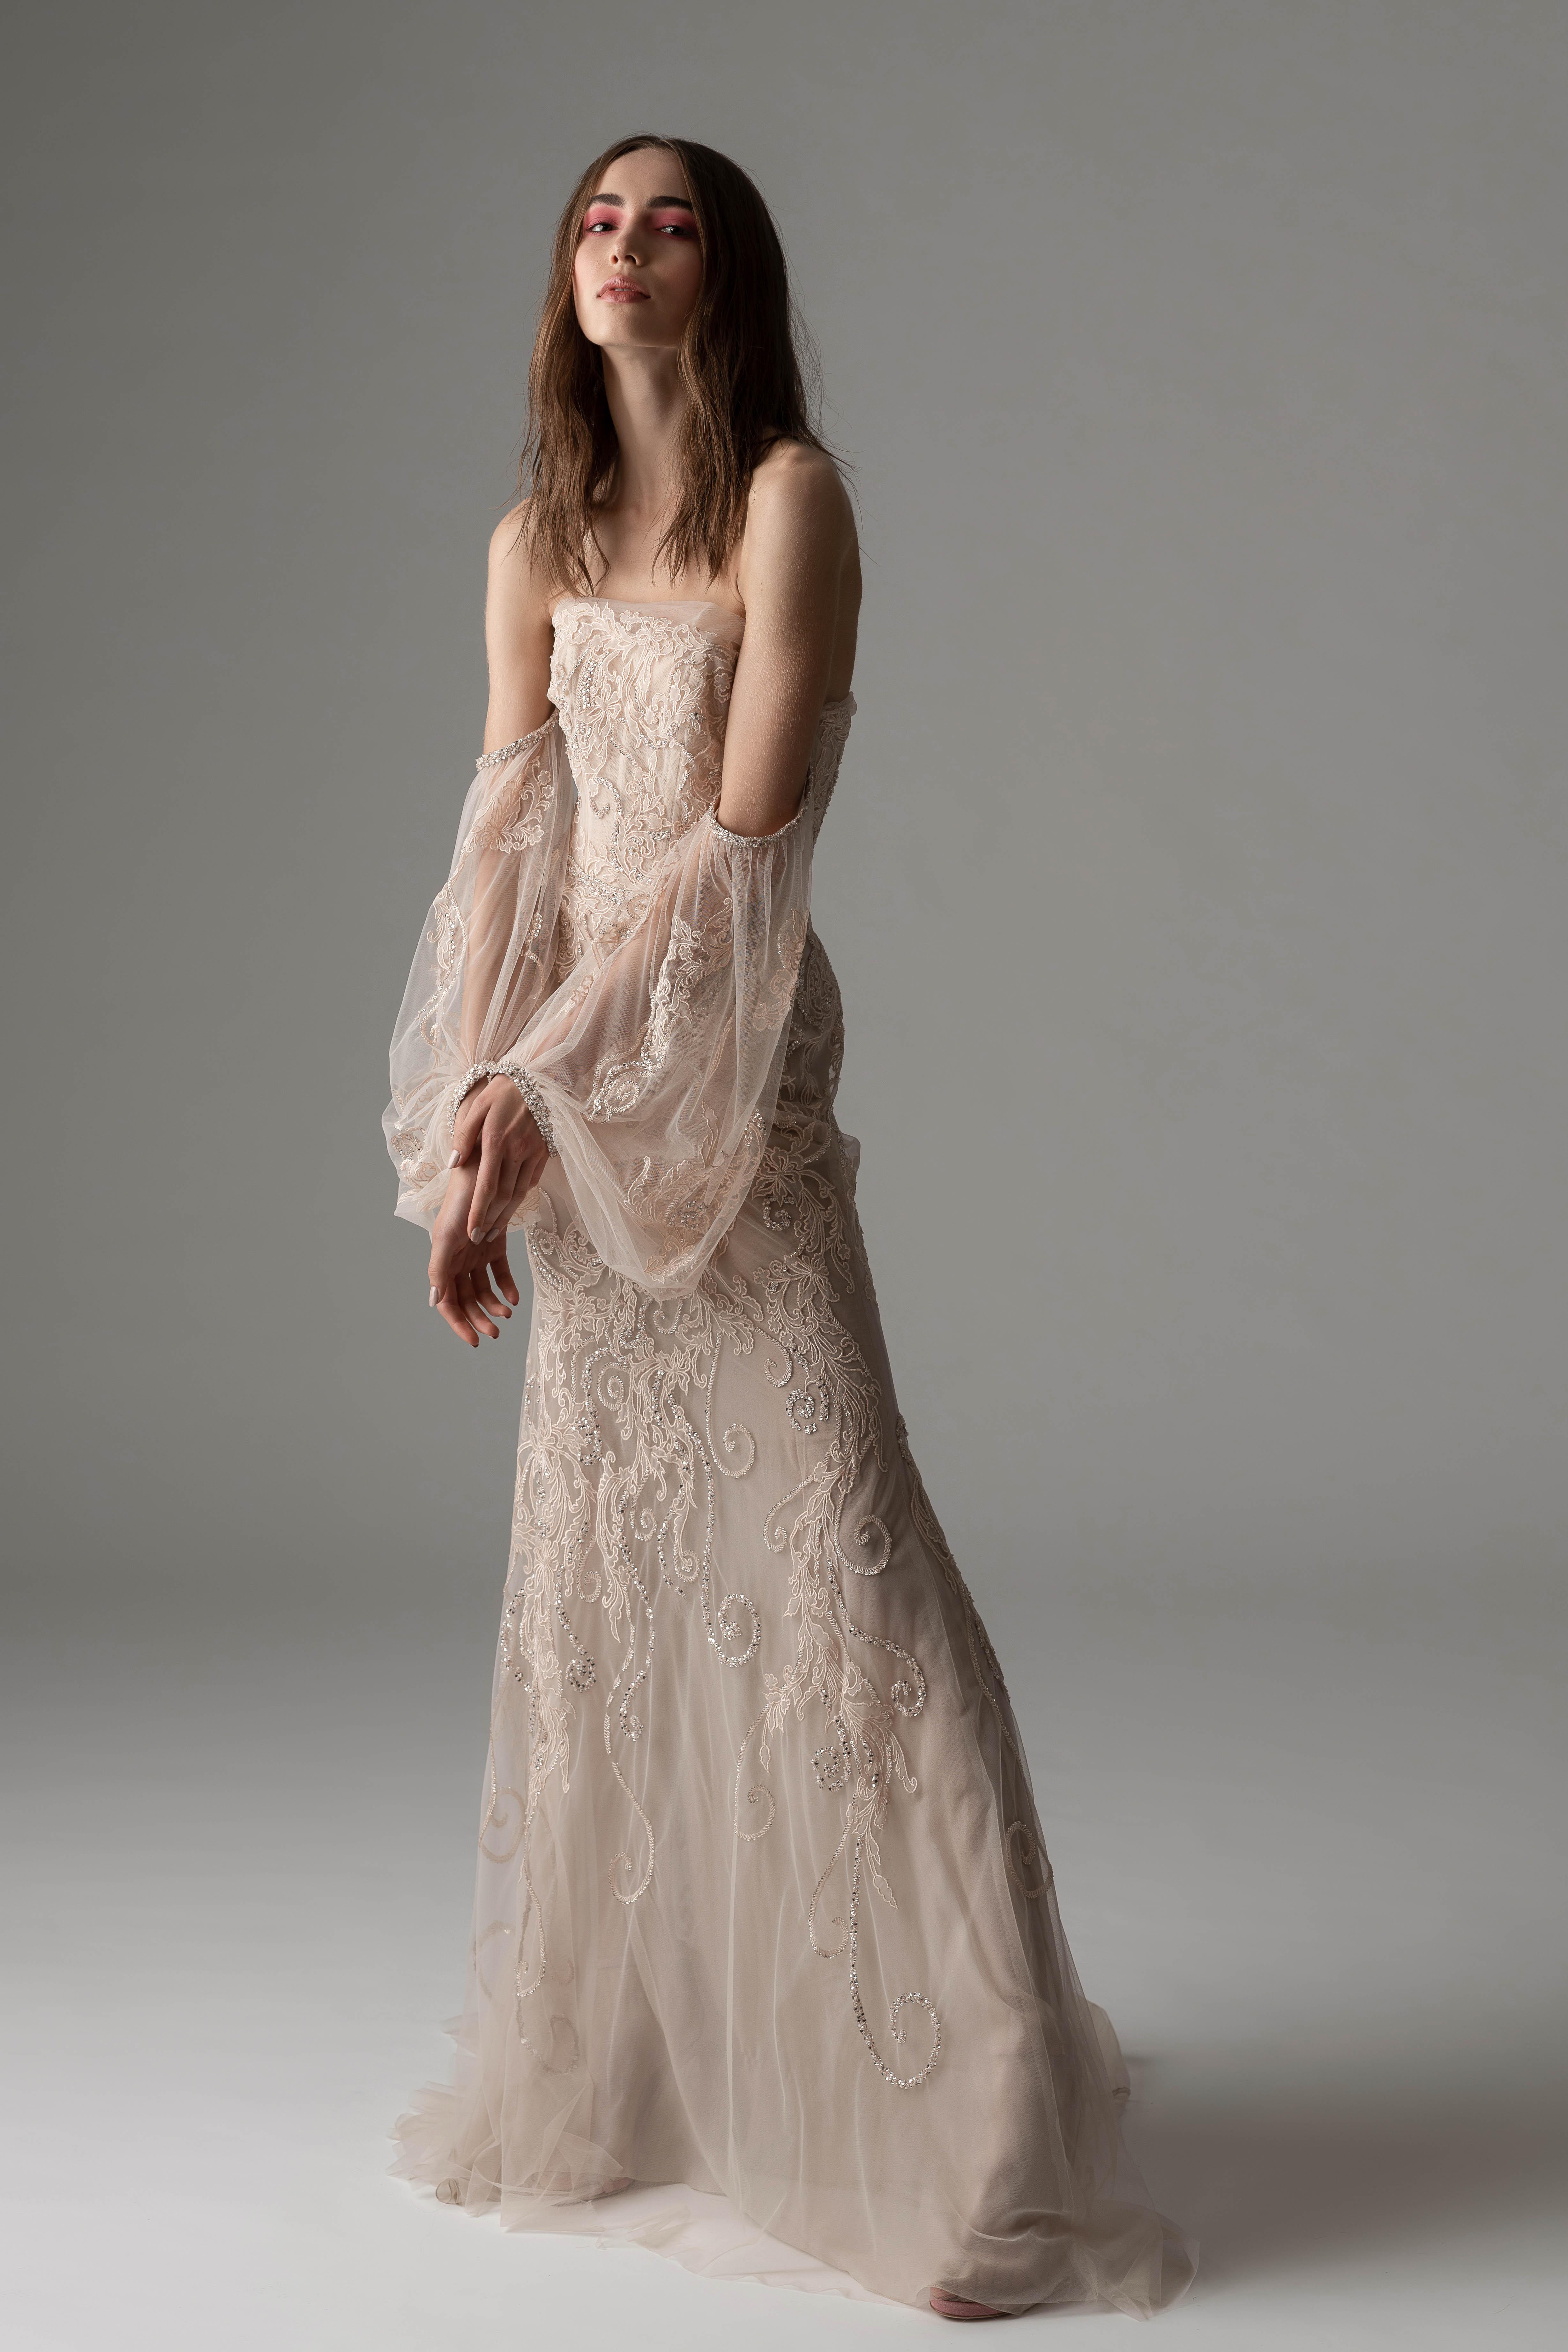 rivini by rita fall 2019 sheath bell sleeve wedding dress